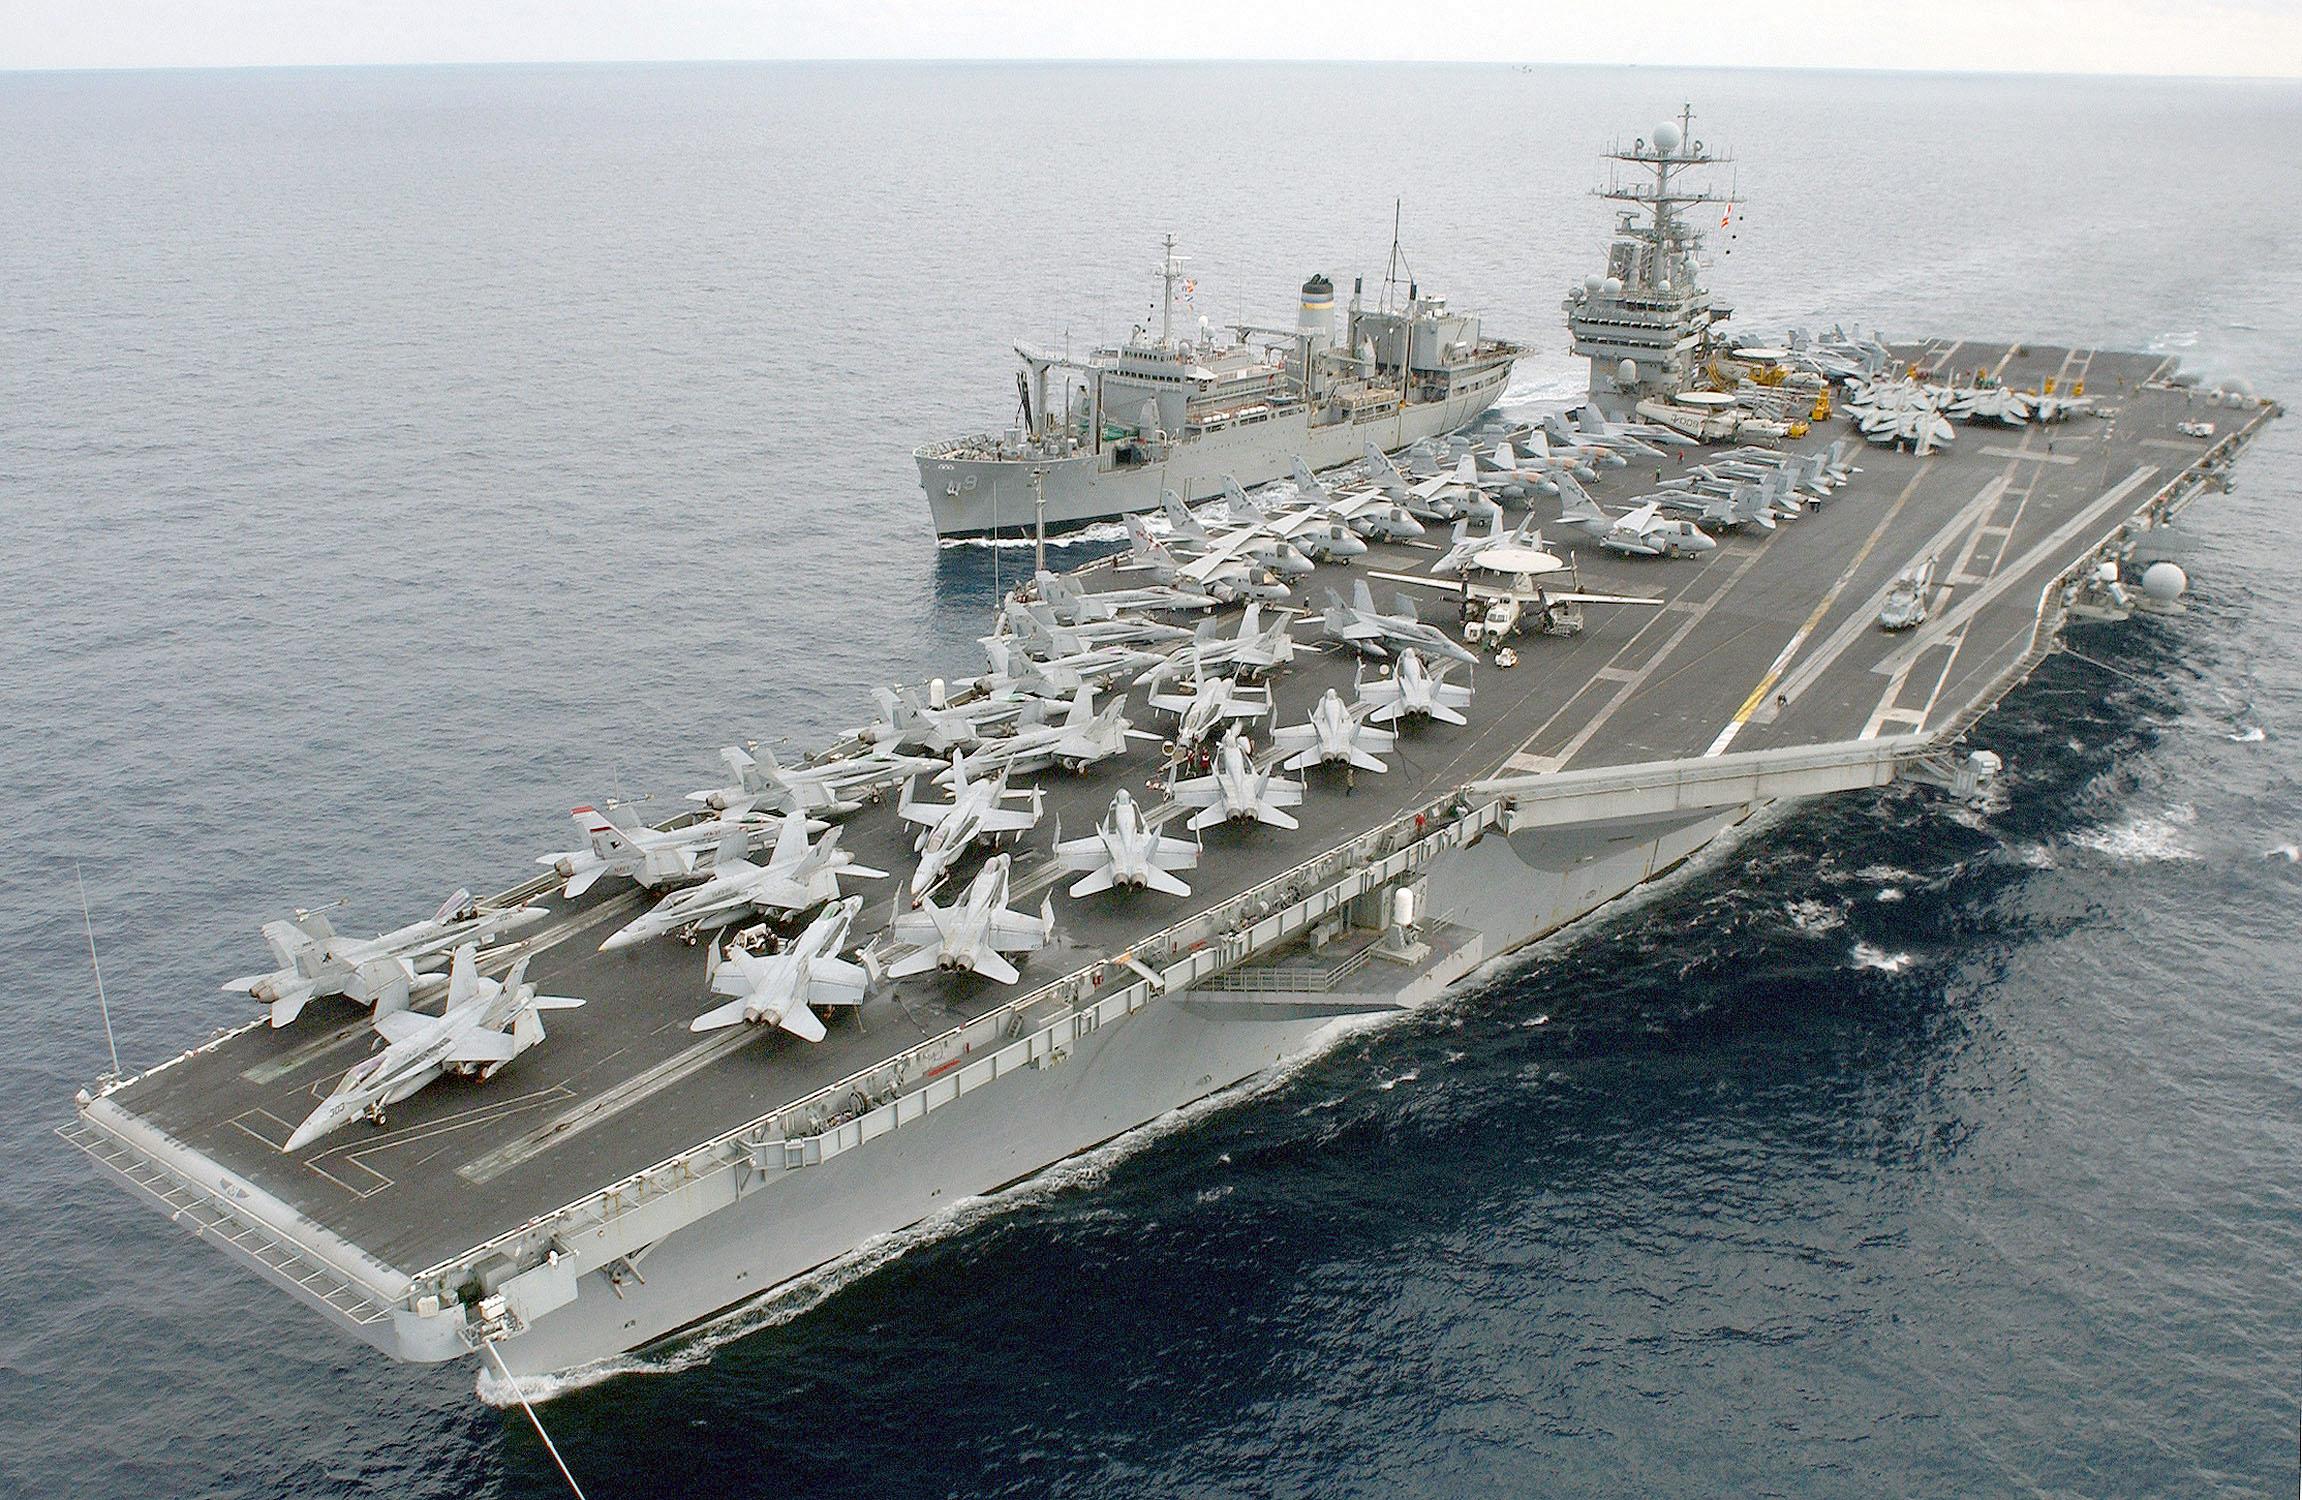 Dall'Africa al Mediterraneo, Lesser (Gmf) svela la strategia Usa